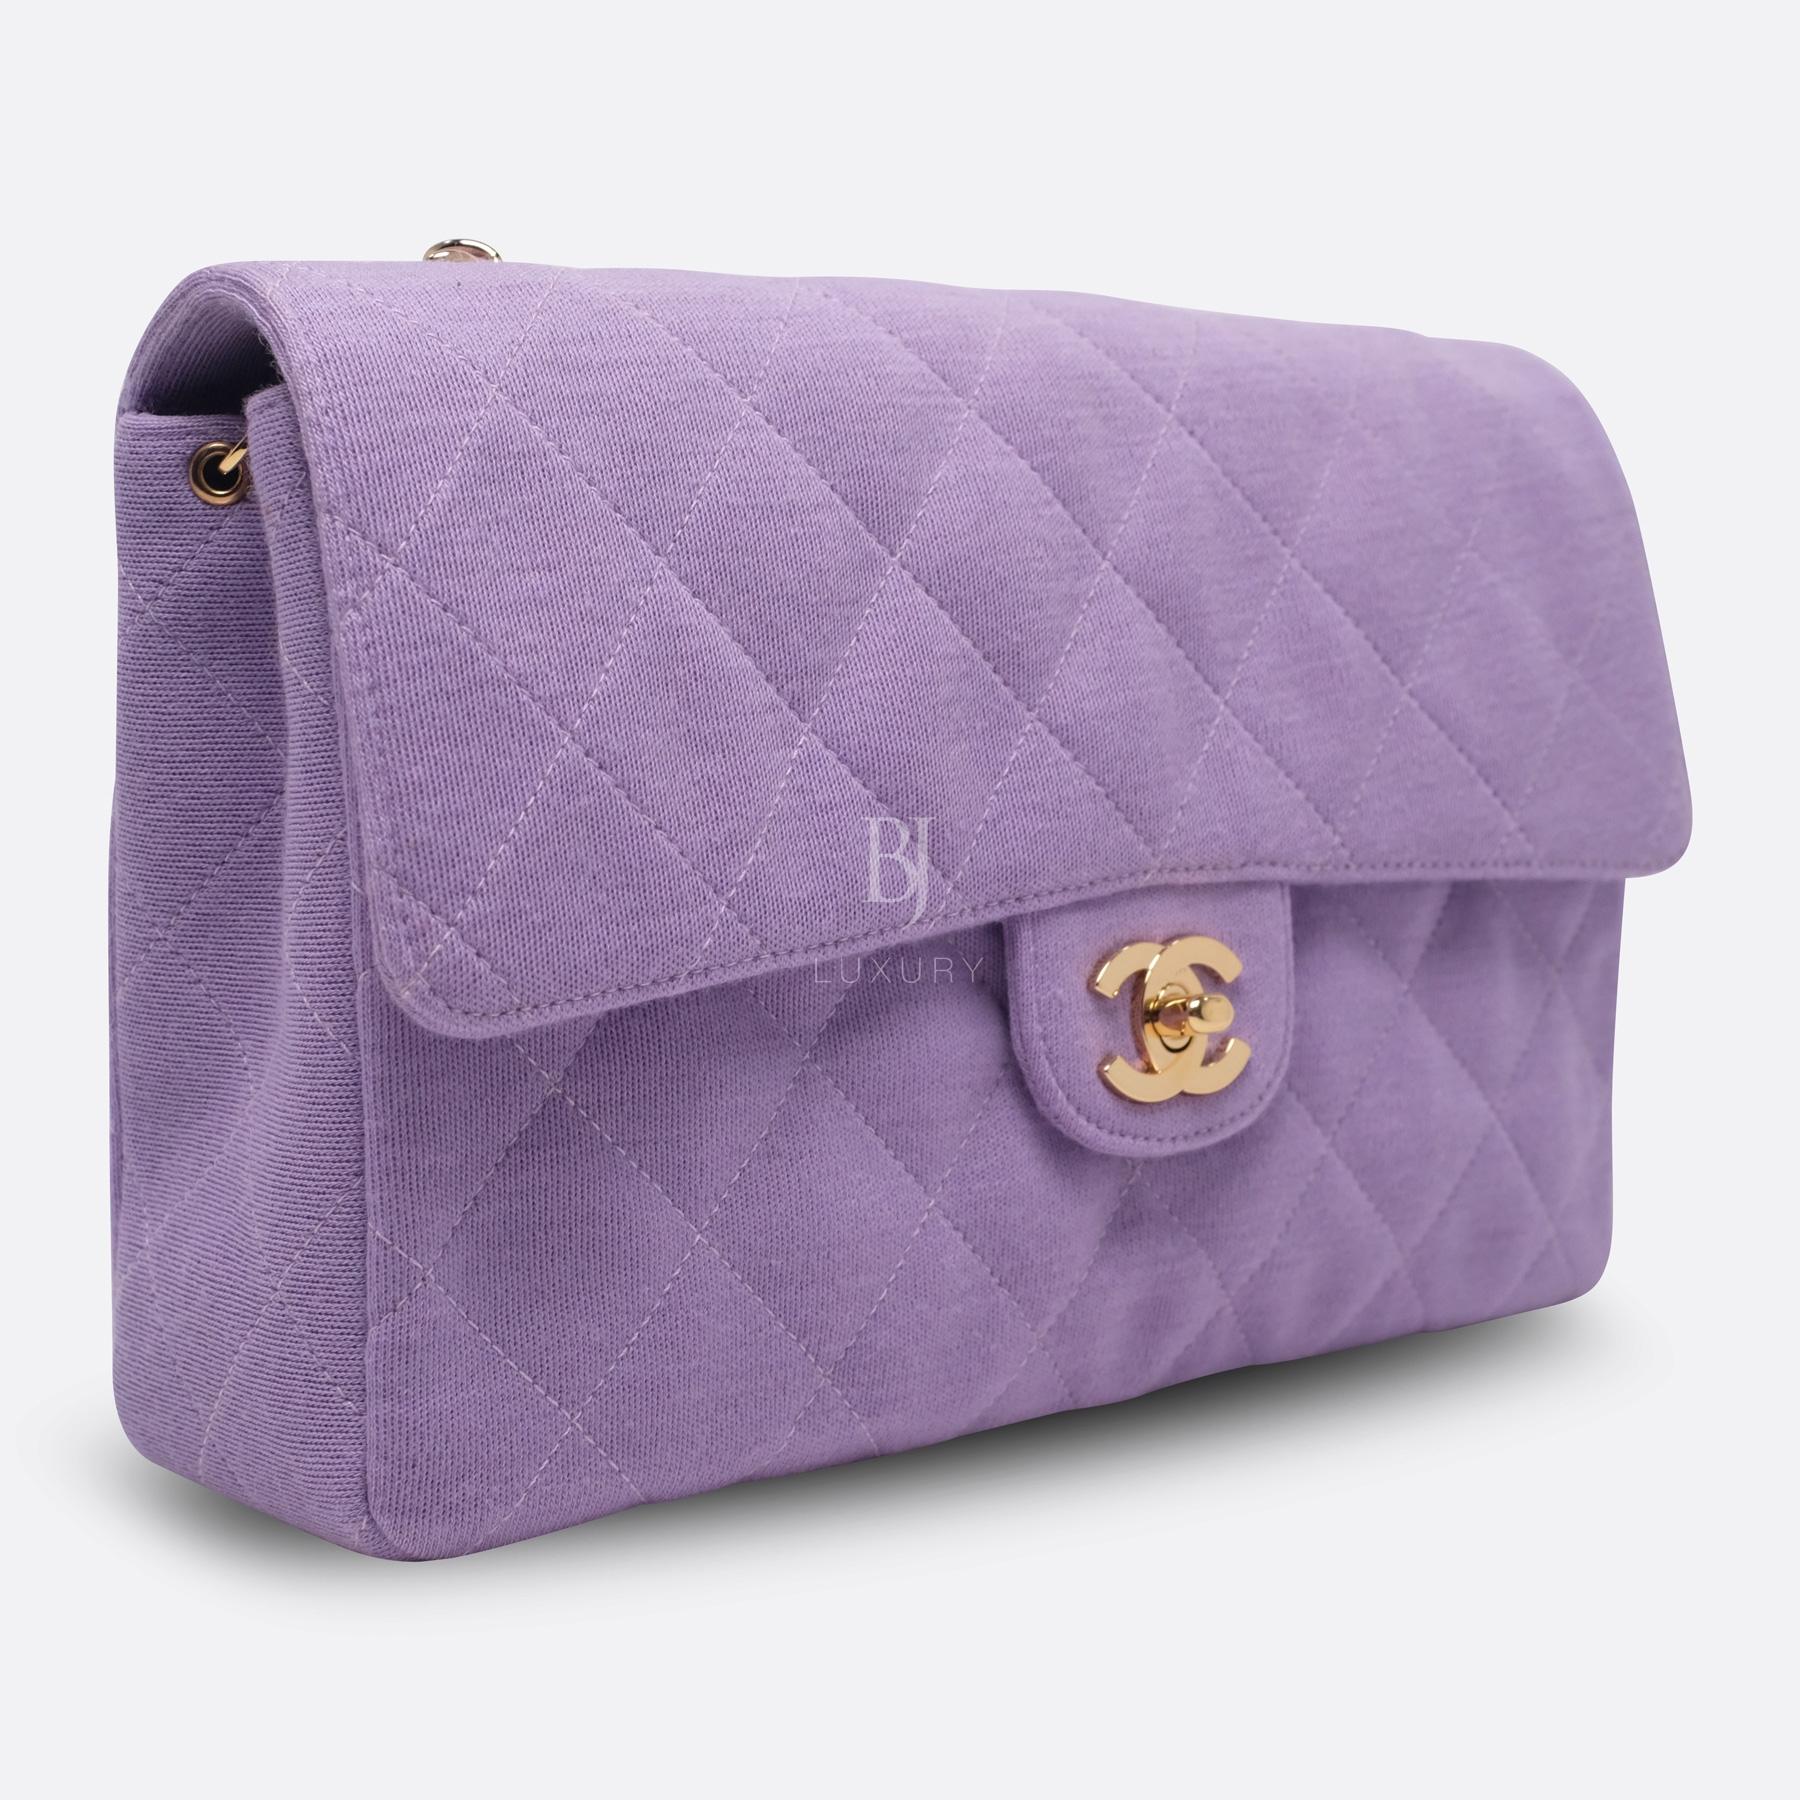 Chanel Flap Bag Medium Jersey Gold Lilac BJ Luxury 2.jpg